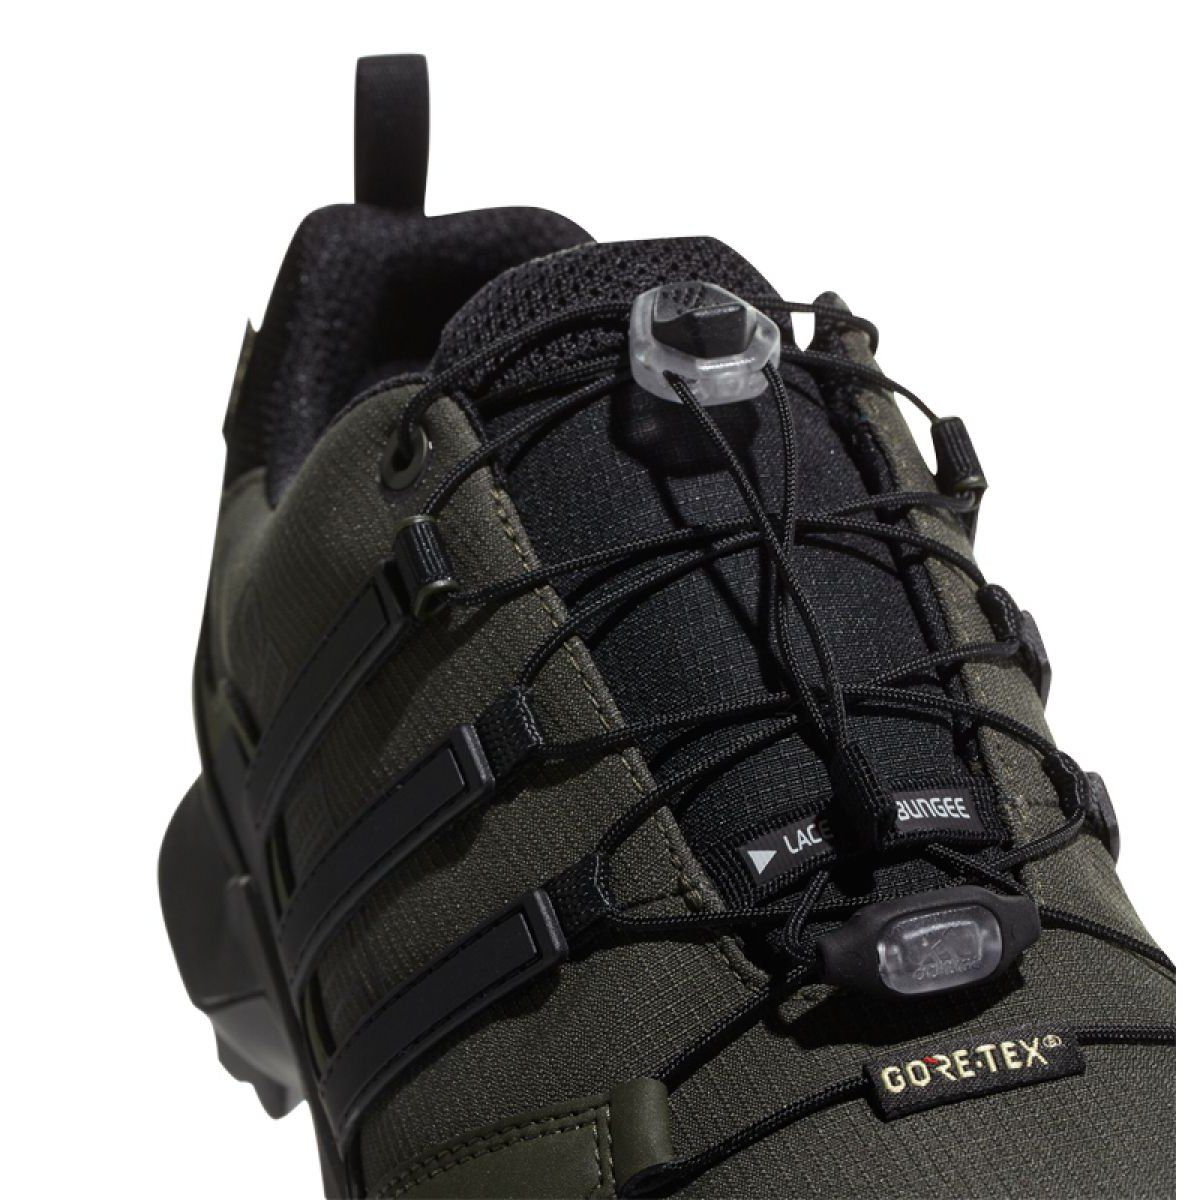 Buty Adidas Terrex Swift R2 Gtx M Zielone Mens Hiking Boots Shoes Sports Shoes Adidas